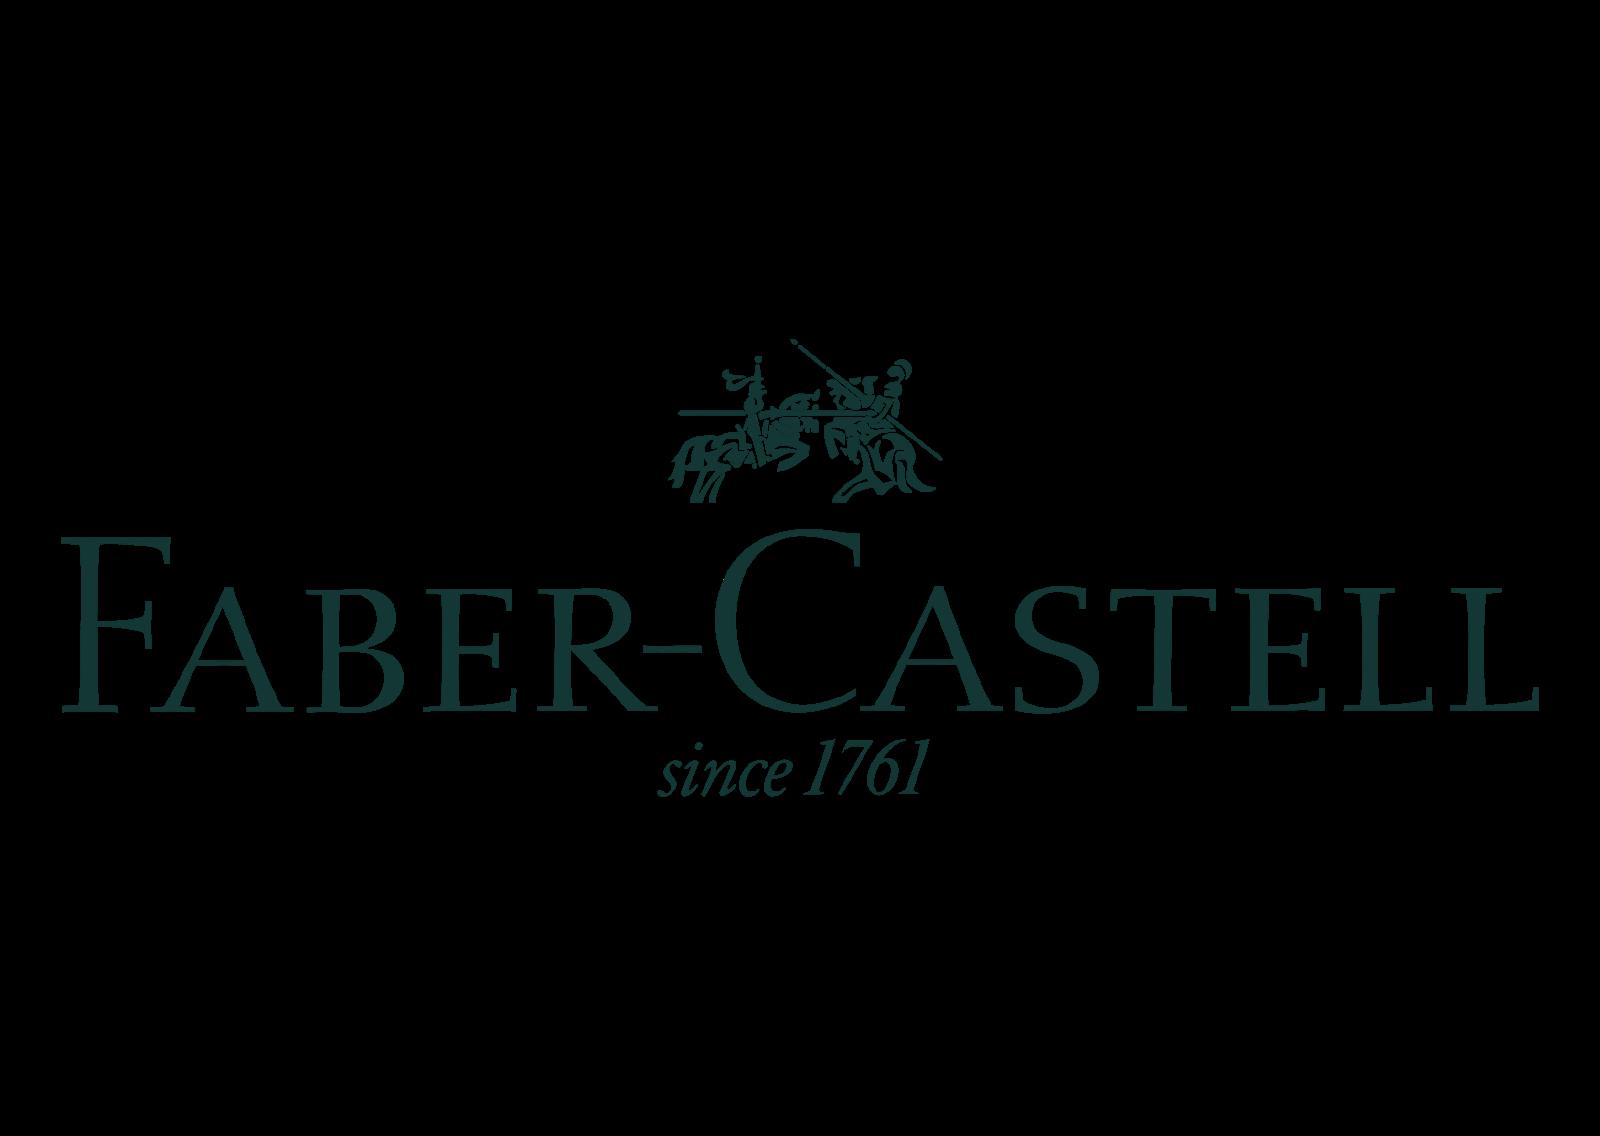 Faber Castell Logo Vector ~ Format Cdr, Ai, Eps, Svg, PDF, PNG